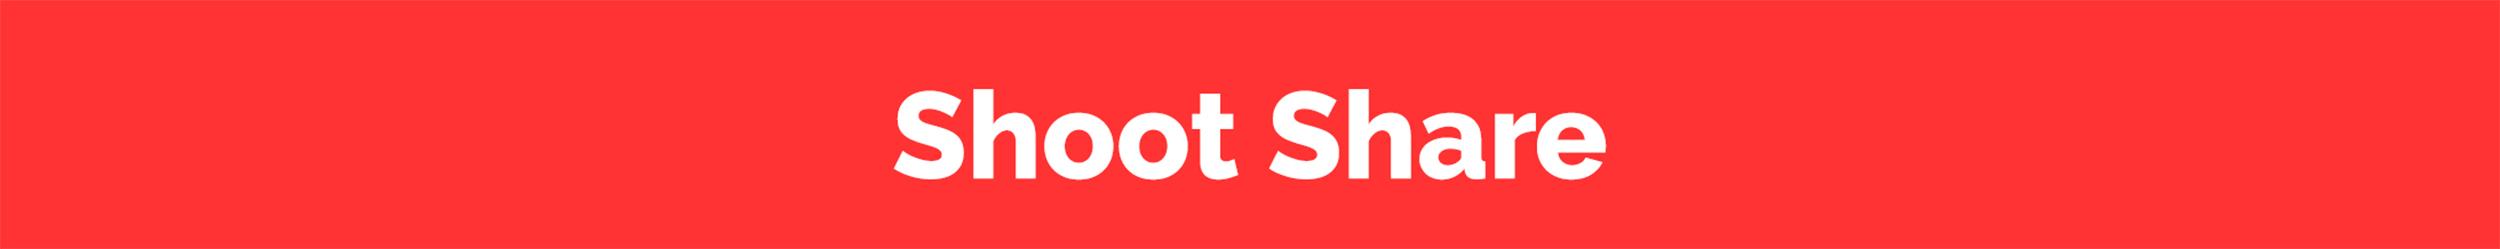 Shoot Share.jpg